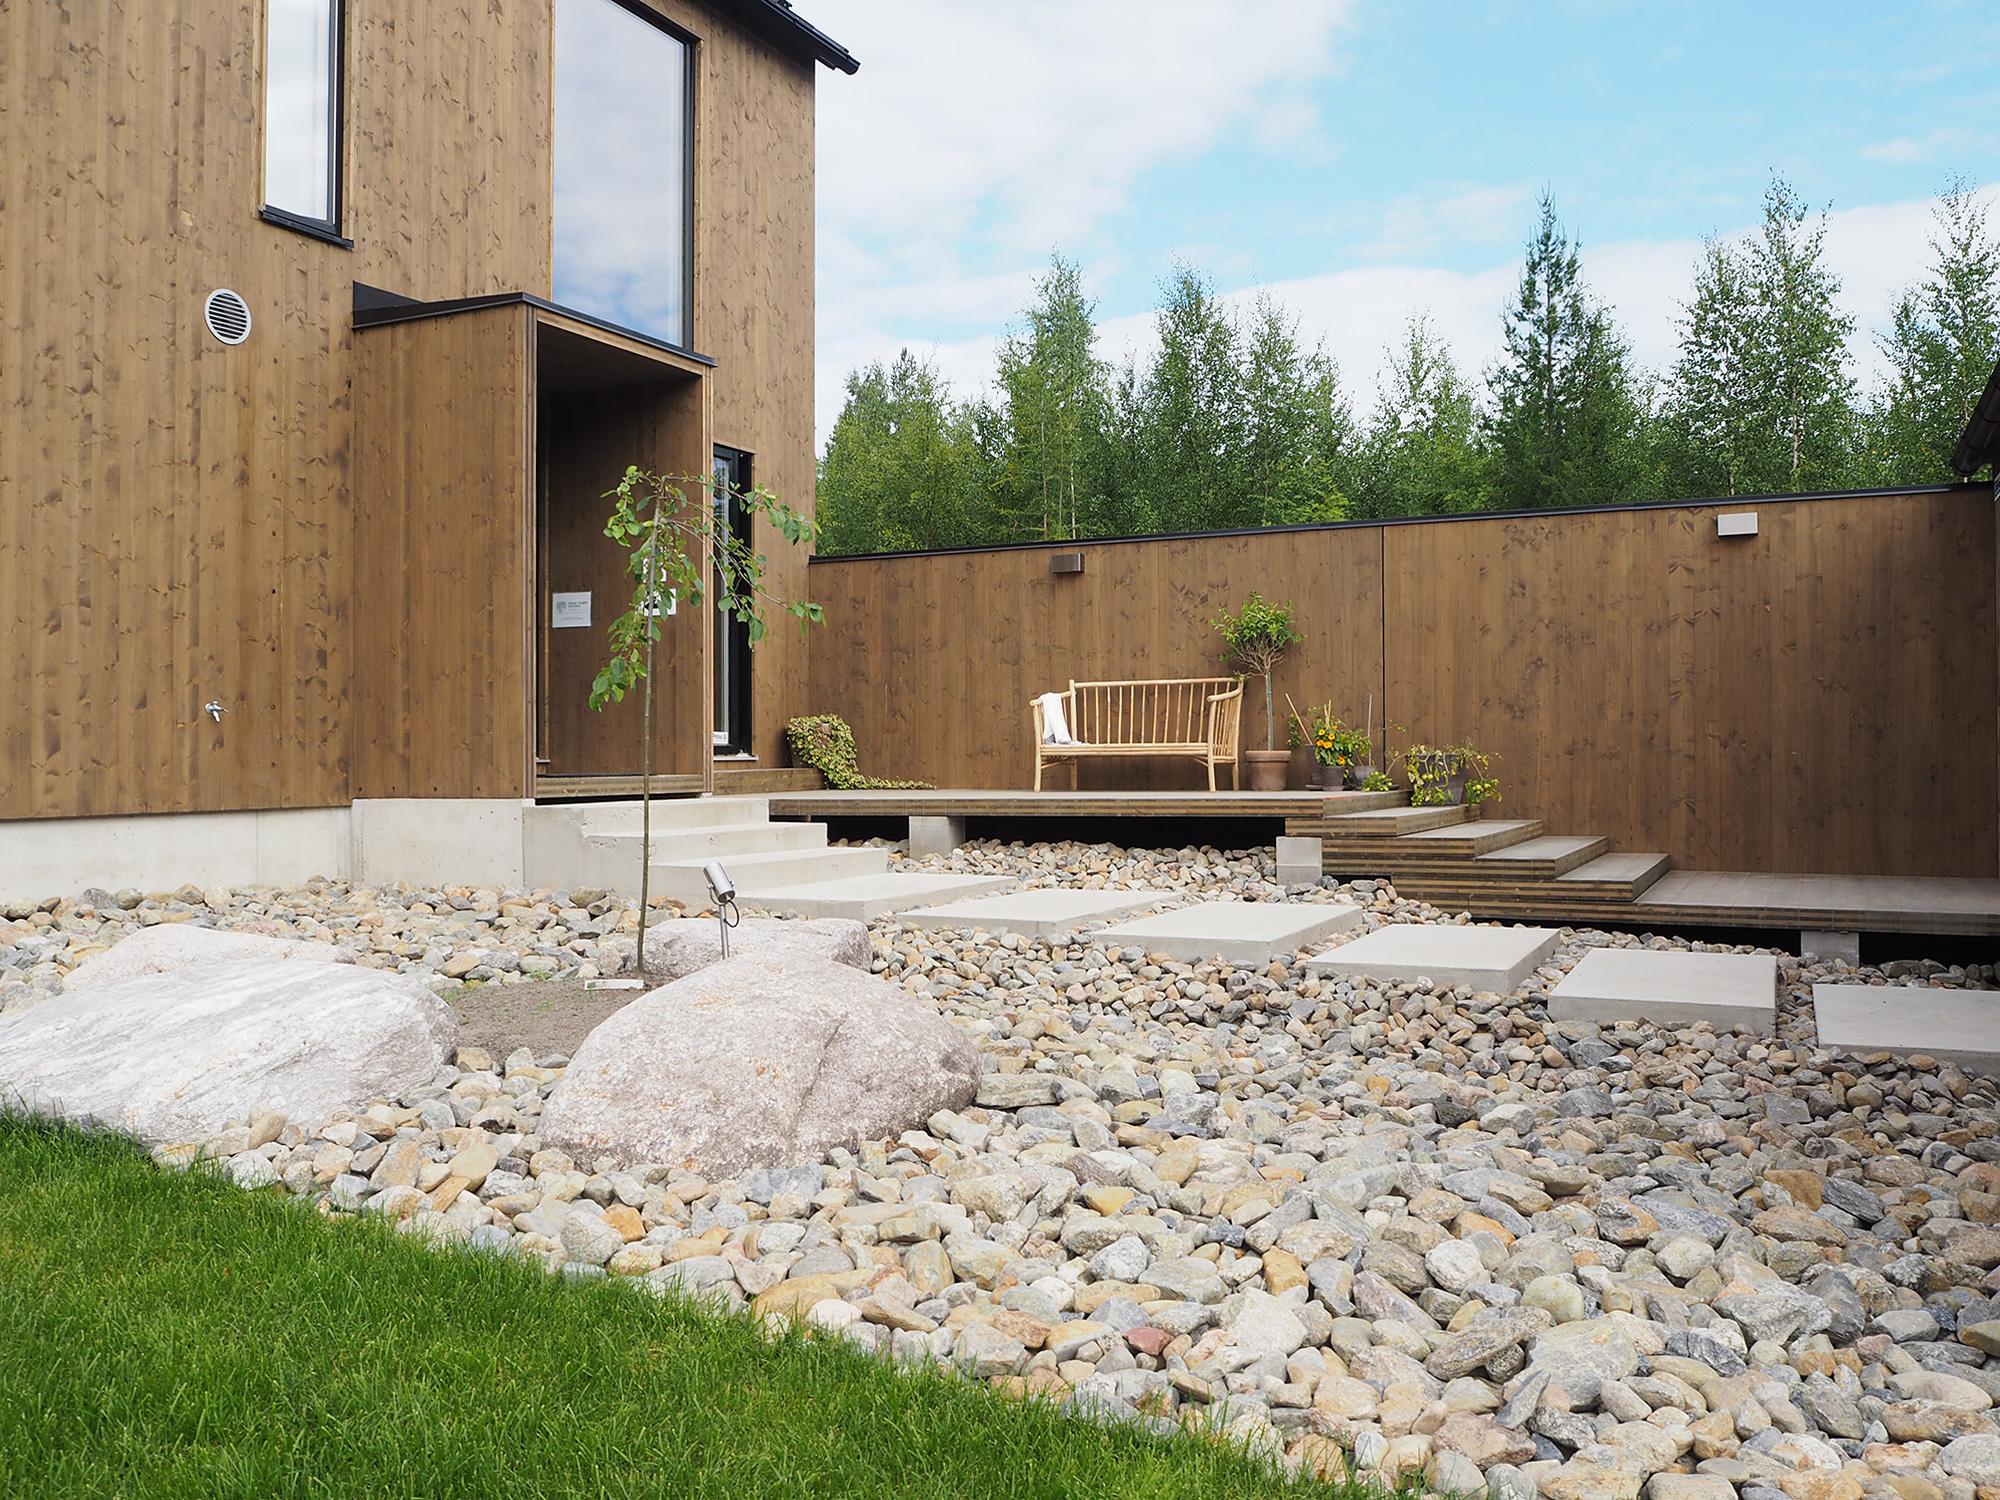 Piha kohteessa Kotola, Asuntomessut 2016 Seinäjoki, moderni talo